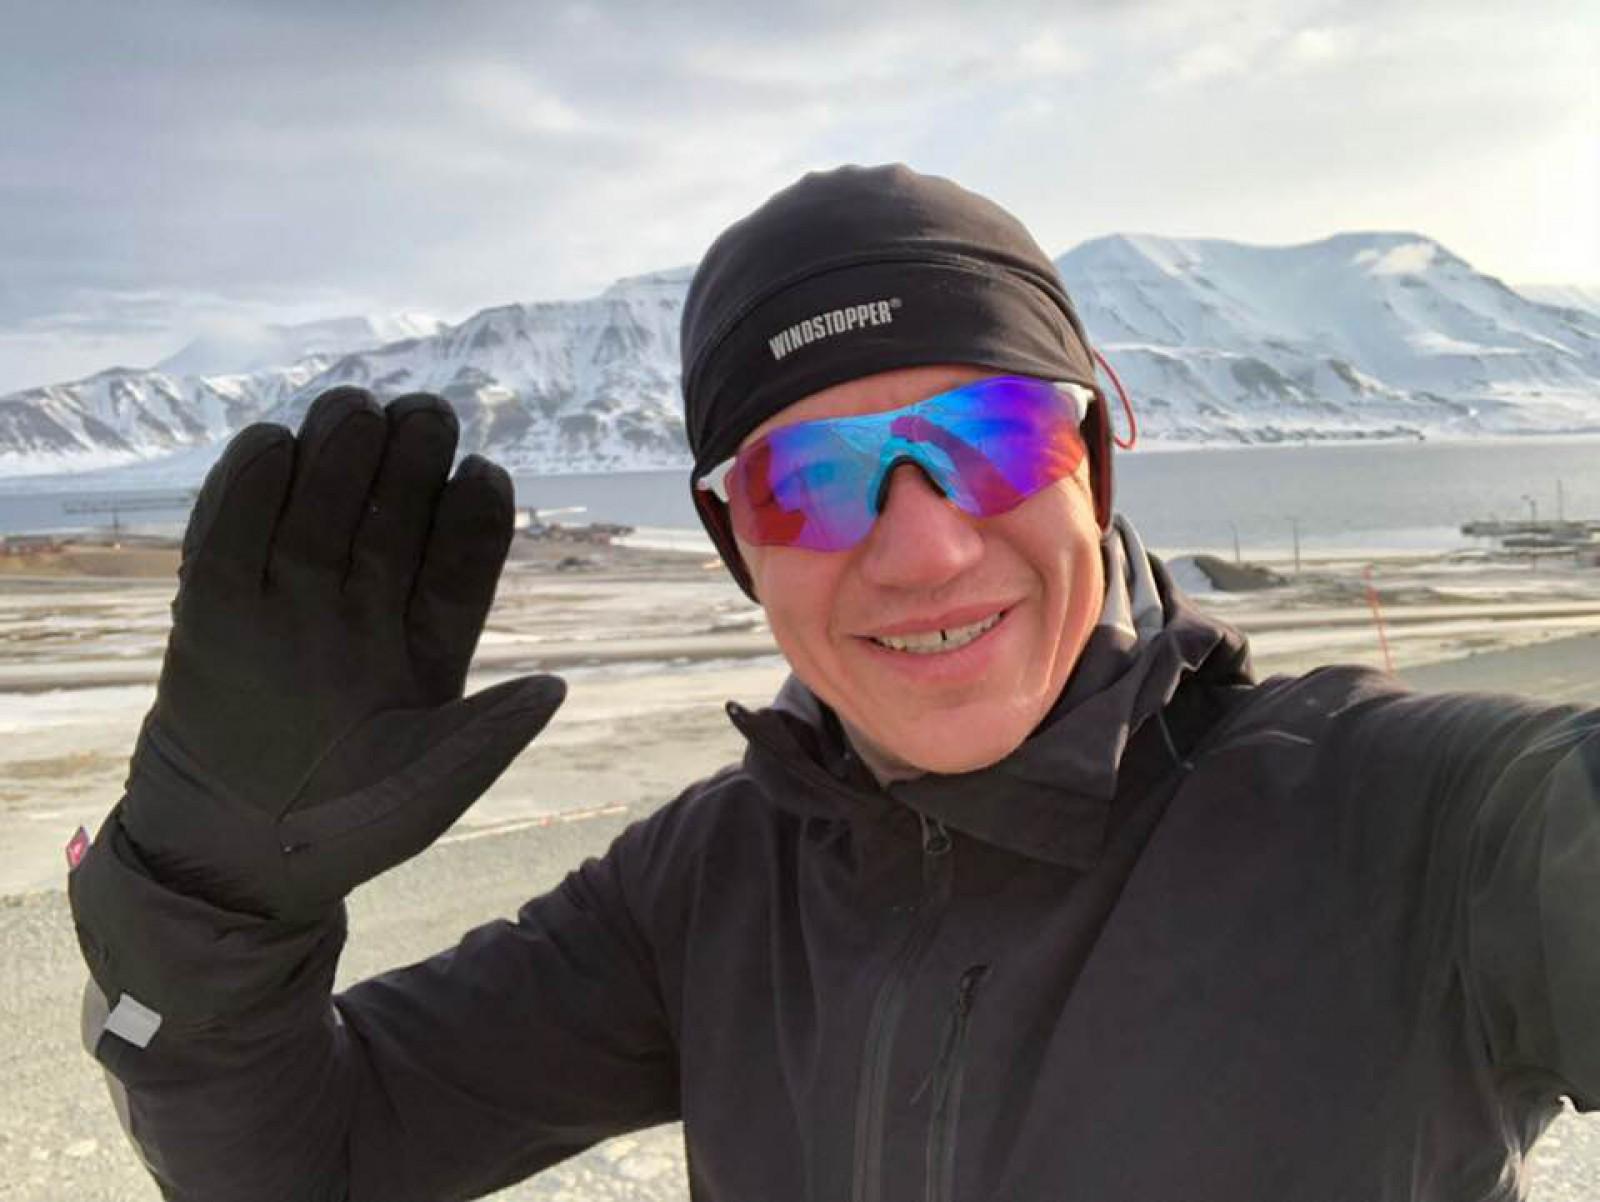 (video) Dmitrii Voloșin a participat la cel mai nordic maraton, la -30 de grade! Moldoveanul a ajuns al doilea la finiș